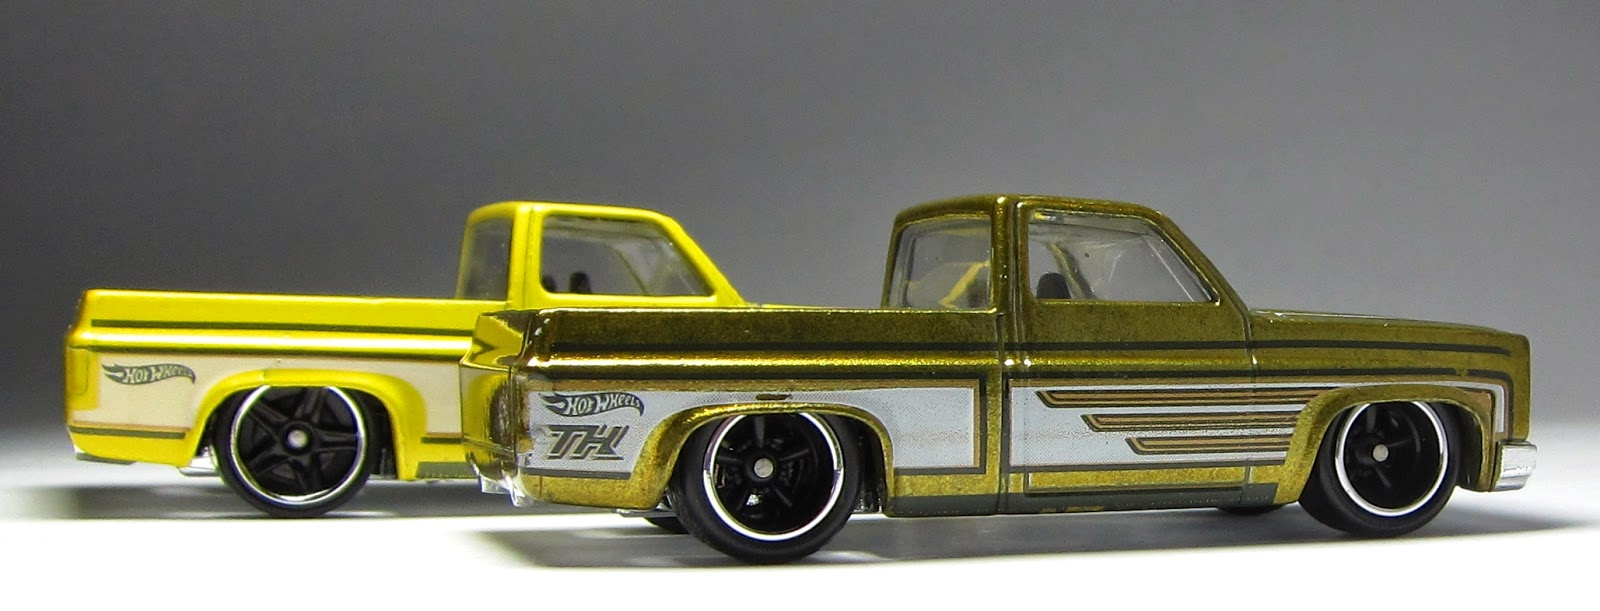 927fc5e11a Cool is Cool is Cool: Hot Wheels '83 Chevy Silverado, Part 1 - 2014 Super  Treasure Hunt.